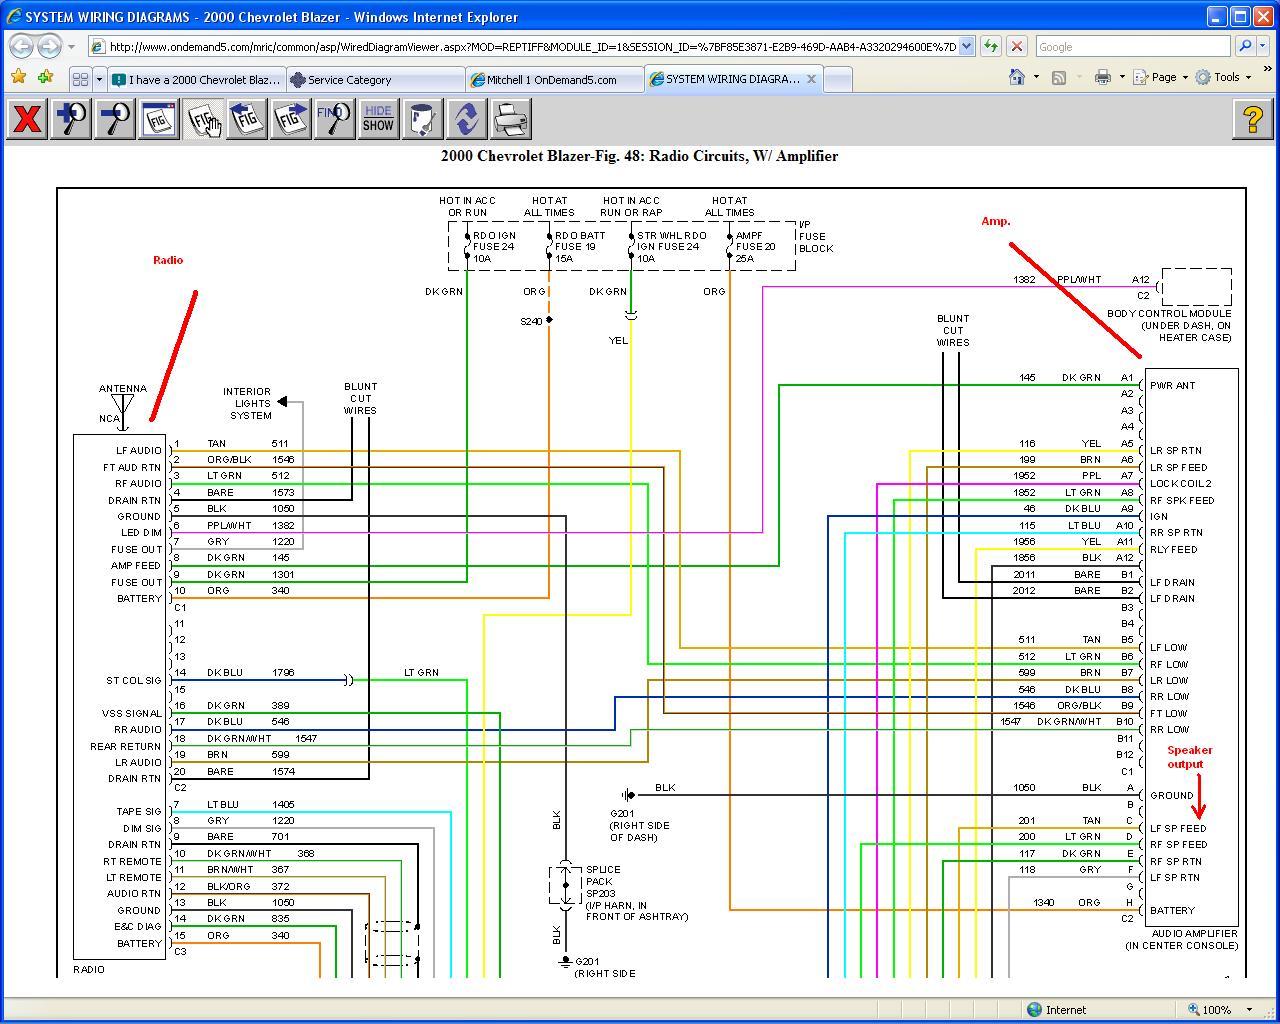 2000 gmc sonoma radio wiring diagram,sonoma download free 2003 Chevy Impala Radio Wiring Diagram 2002 gmc sonoma radio wiring diagram wiring diagram 2003 chevy impala radio wiring diagram